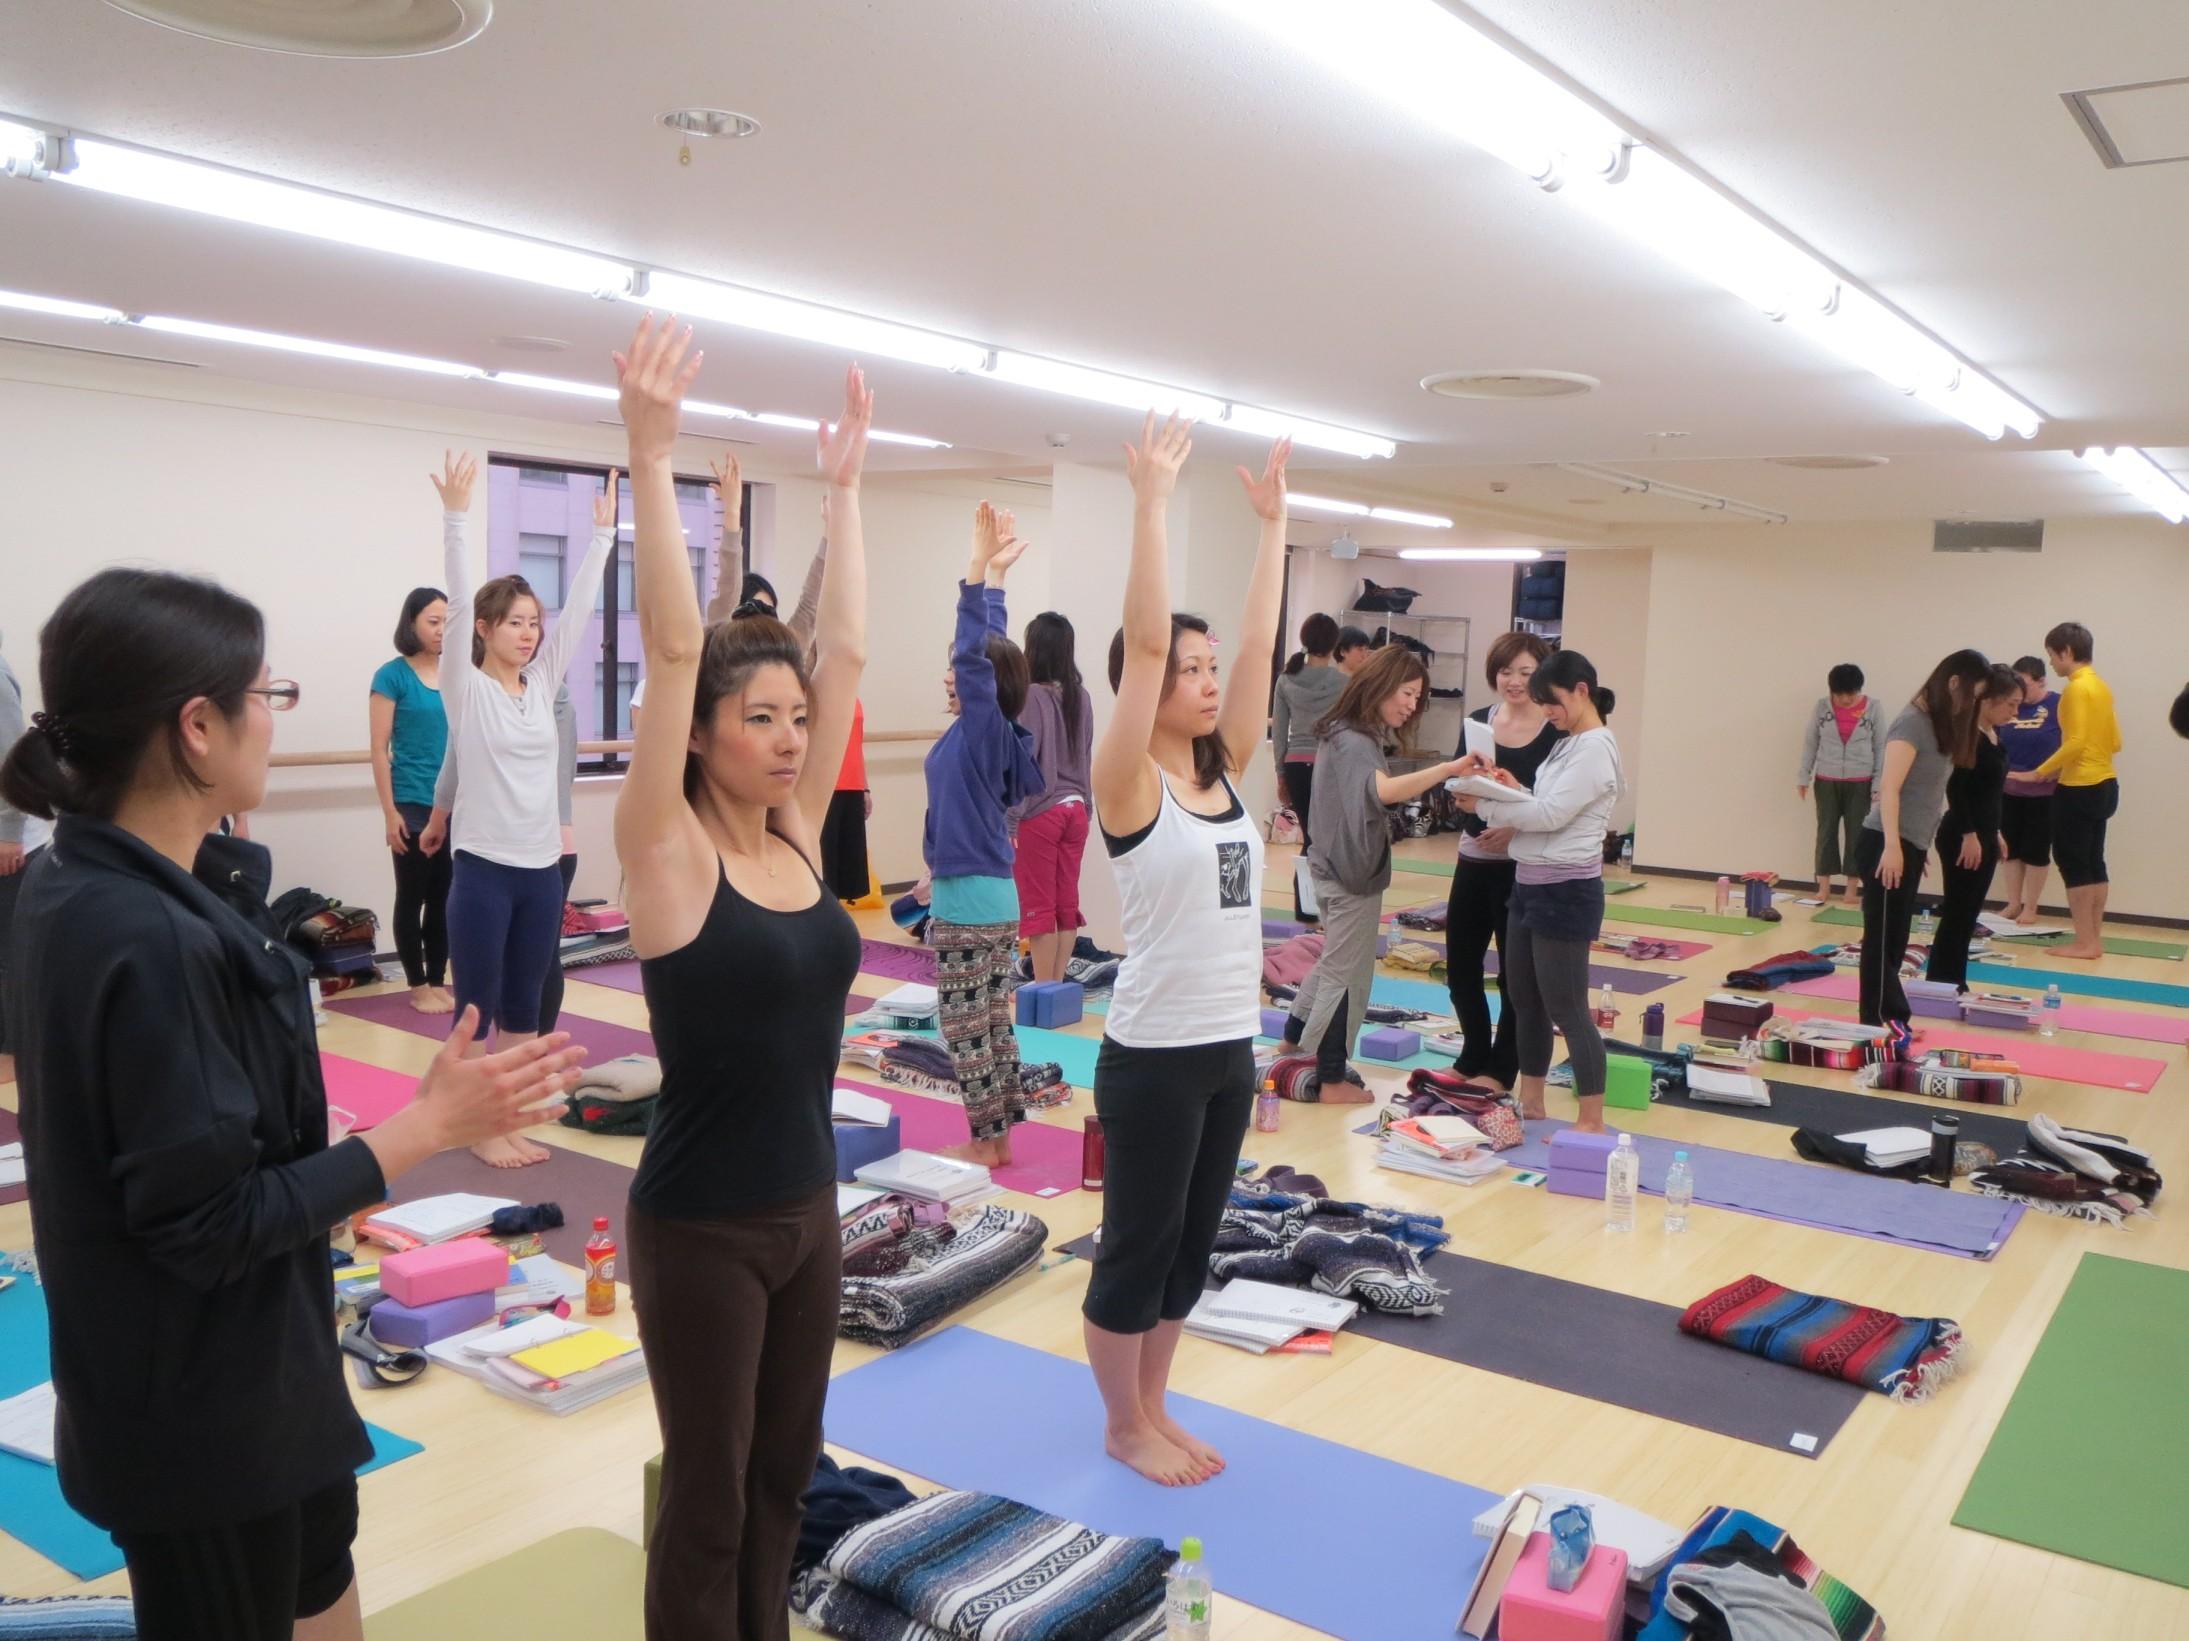 Yogaworks 200hr Teacher Training 2012, Tokyo